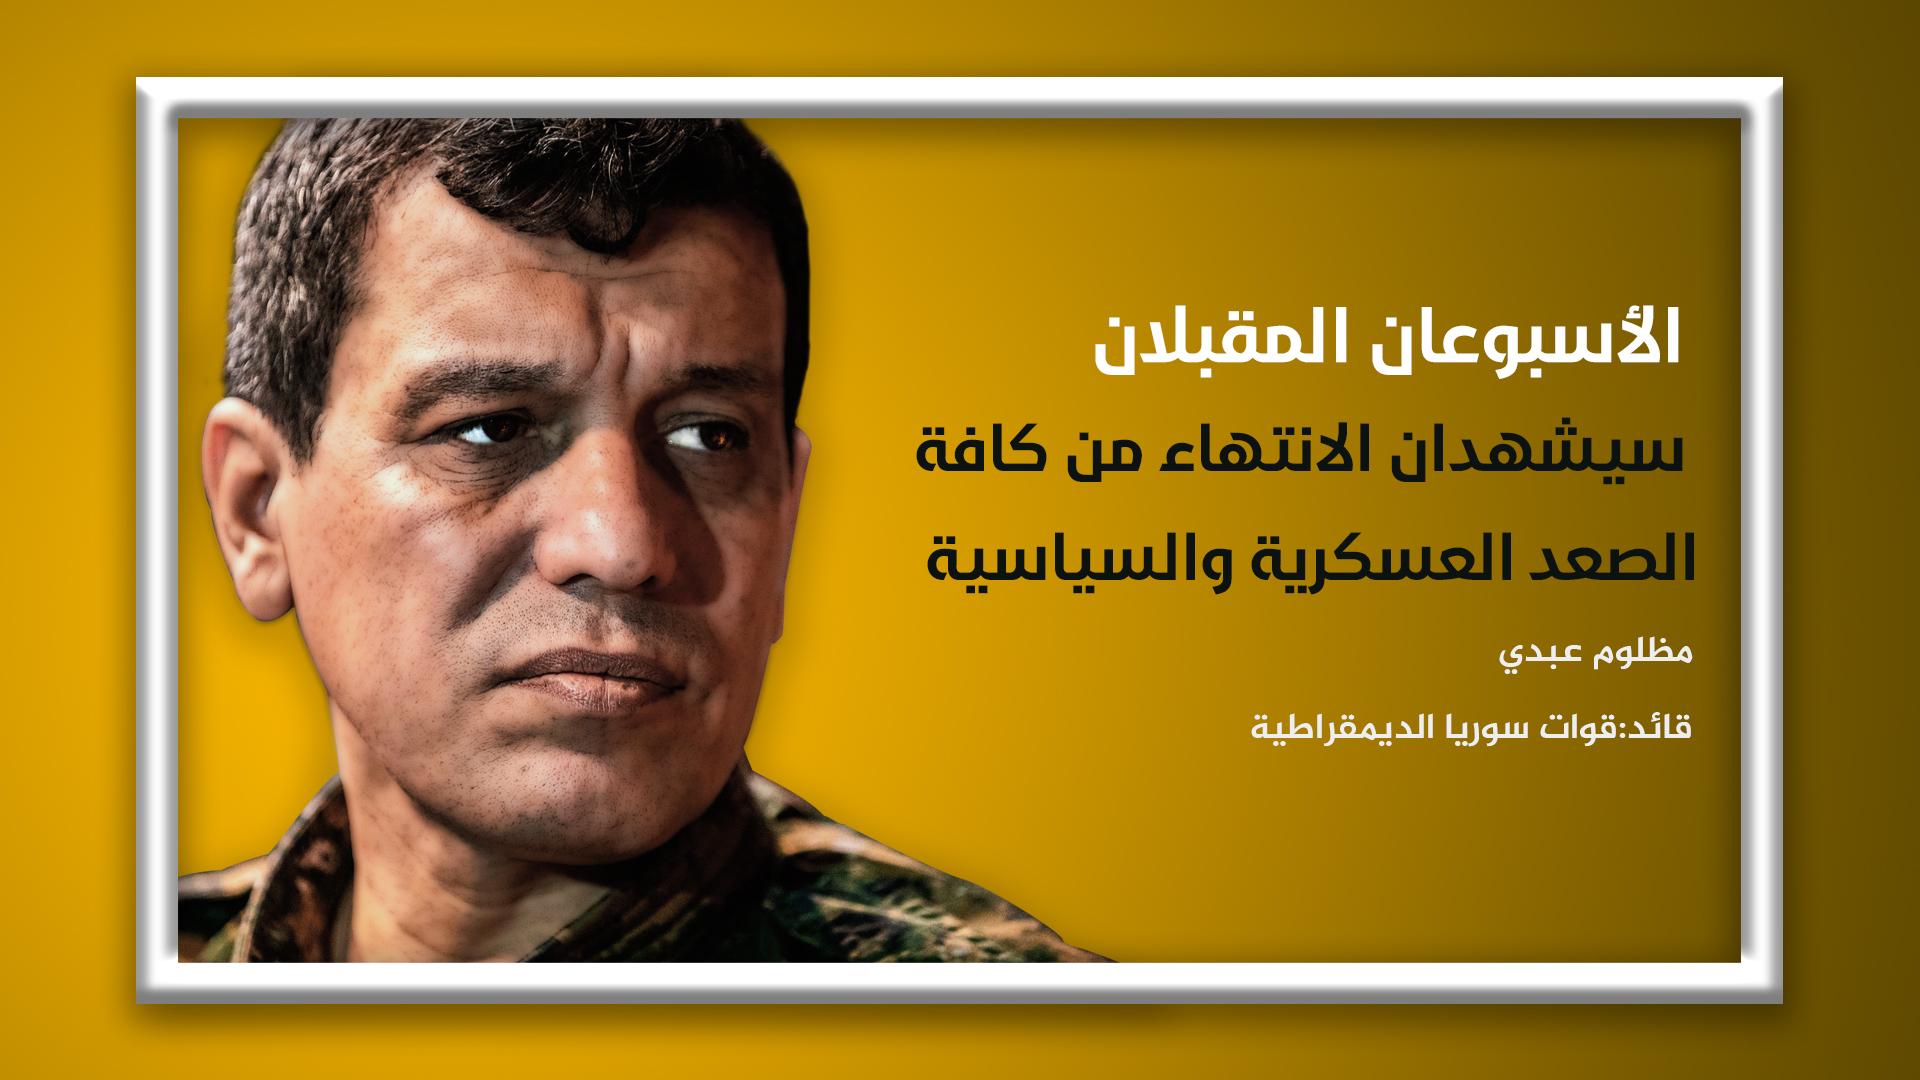 Photo of مظلوم عبدي: الأسبوعان المقبلان سيشهدان الانتهاء من كافة الصعد العسكرية والسياسية